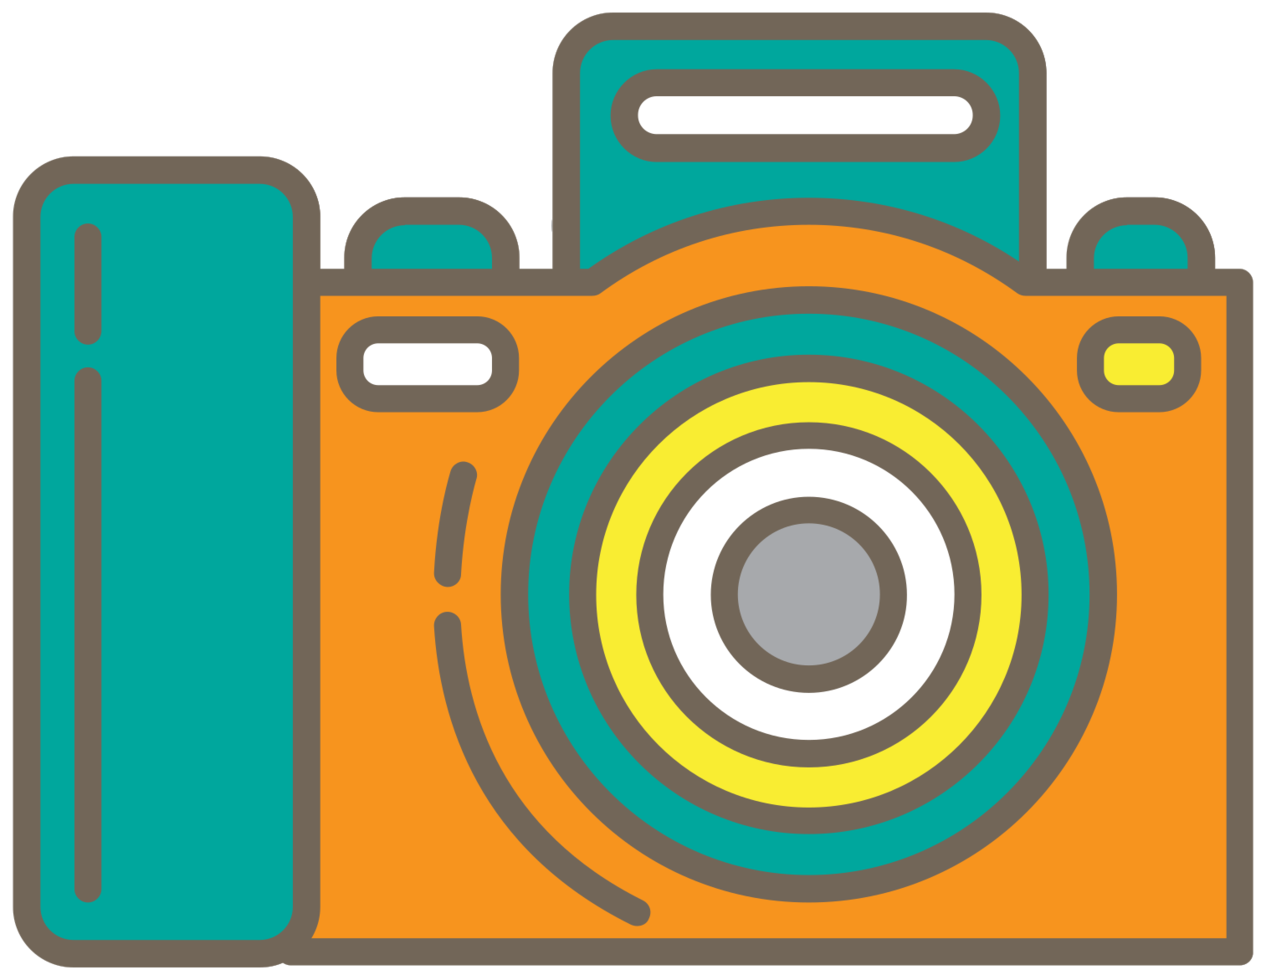 kamera png